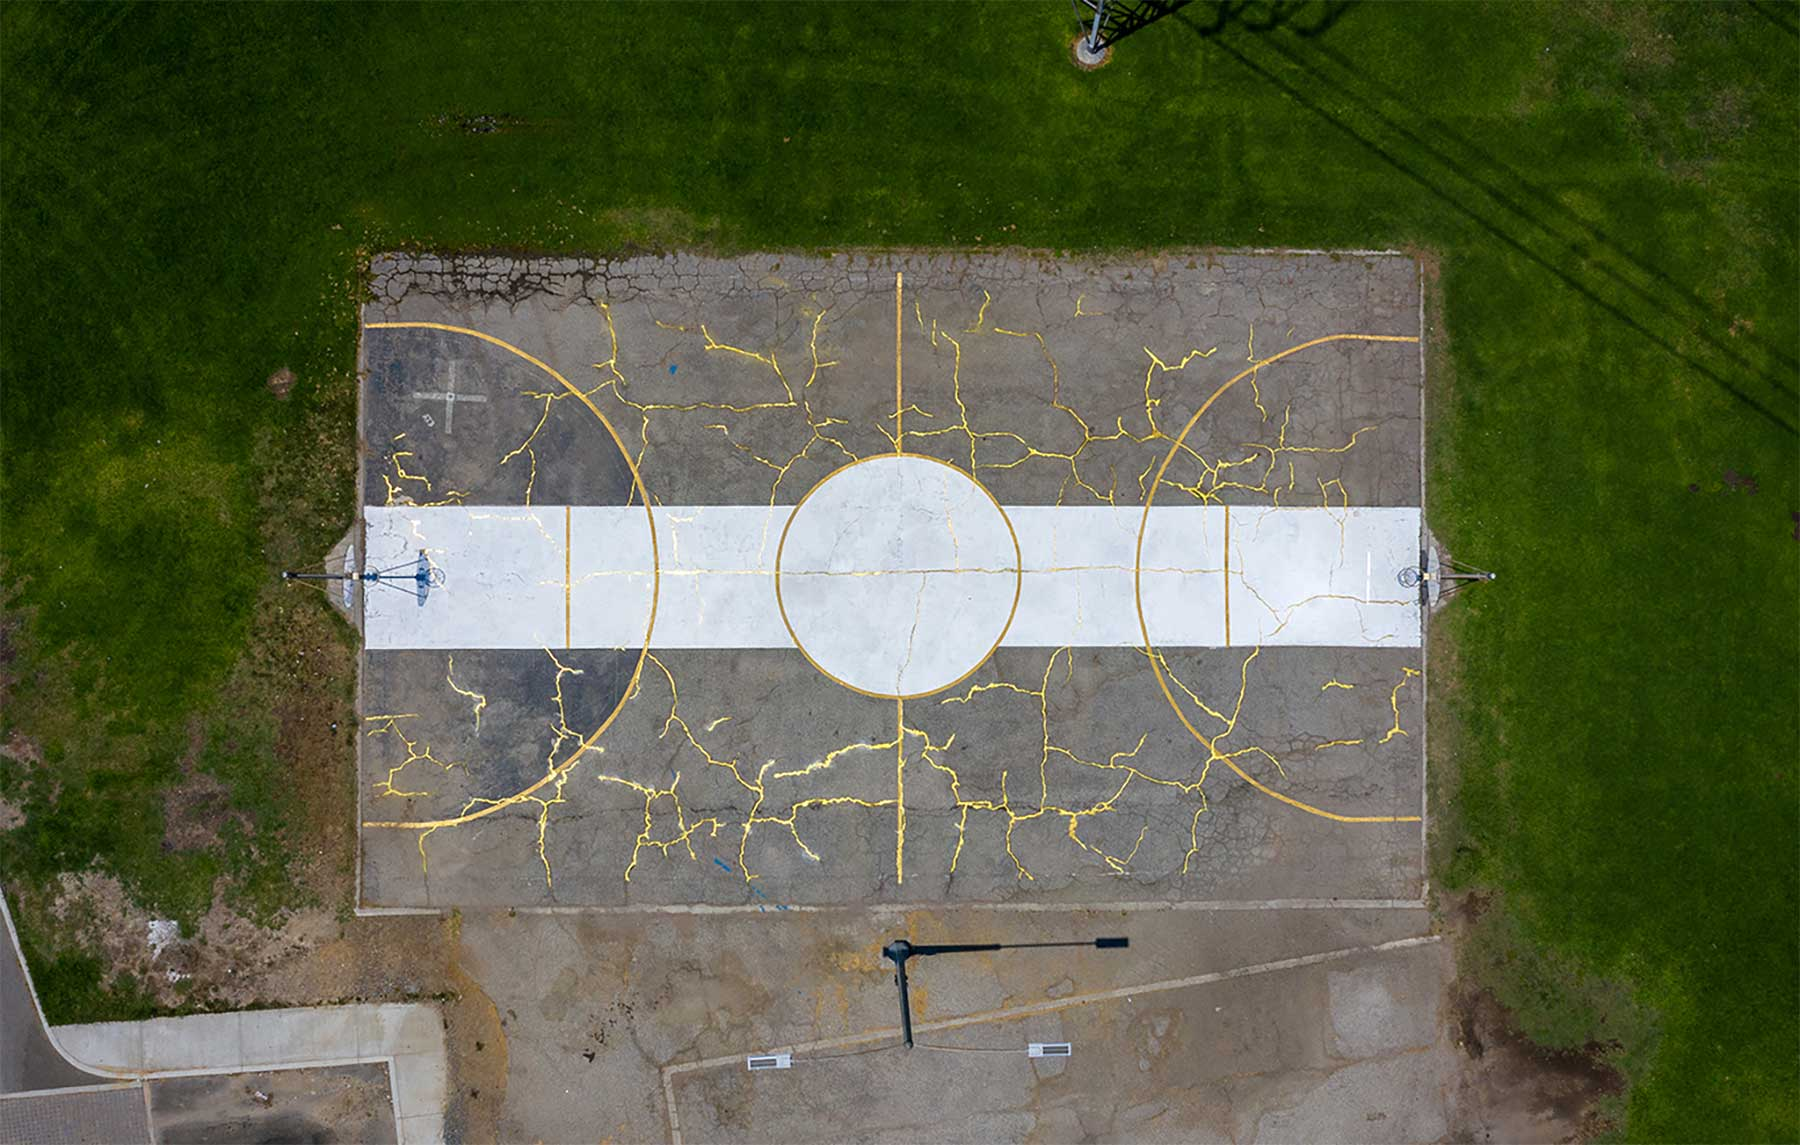 Basketball-Platz im Kintsugi-Stil